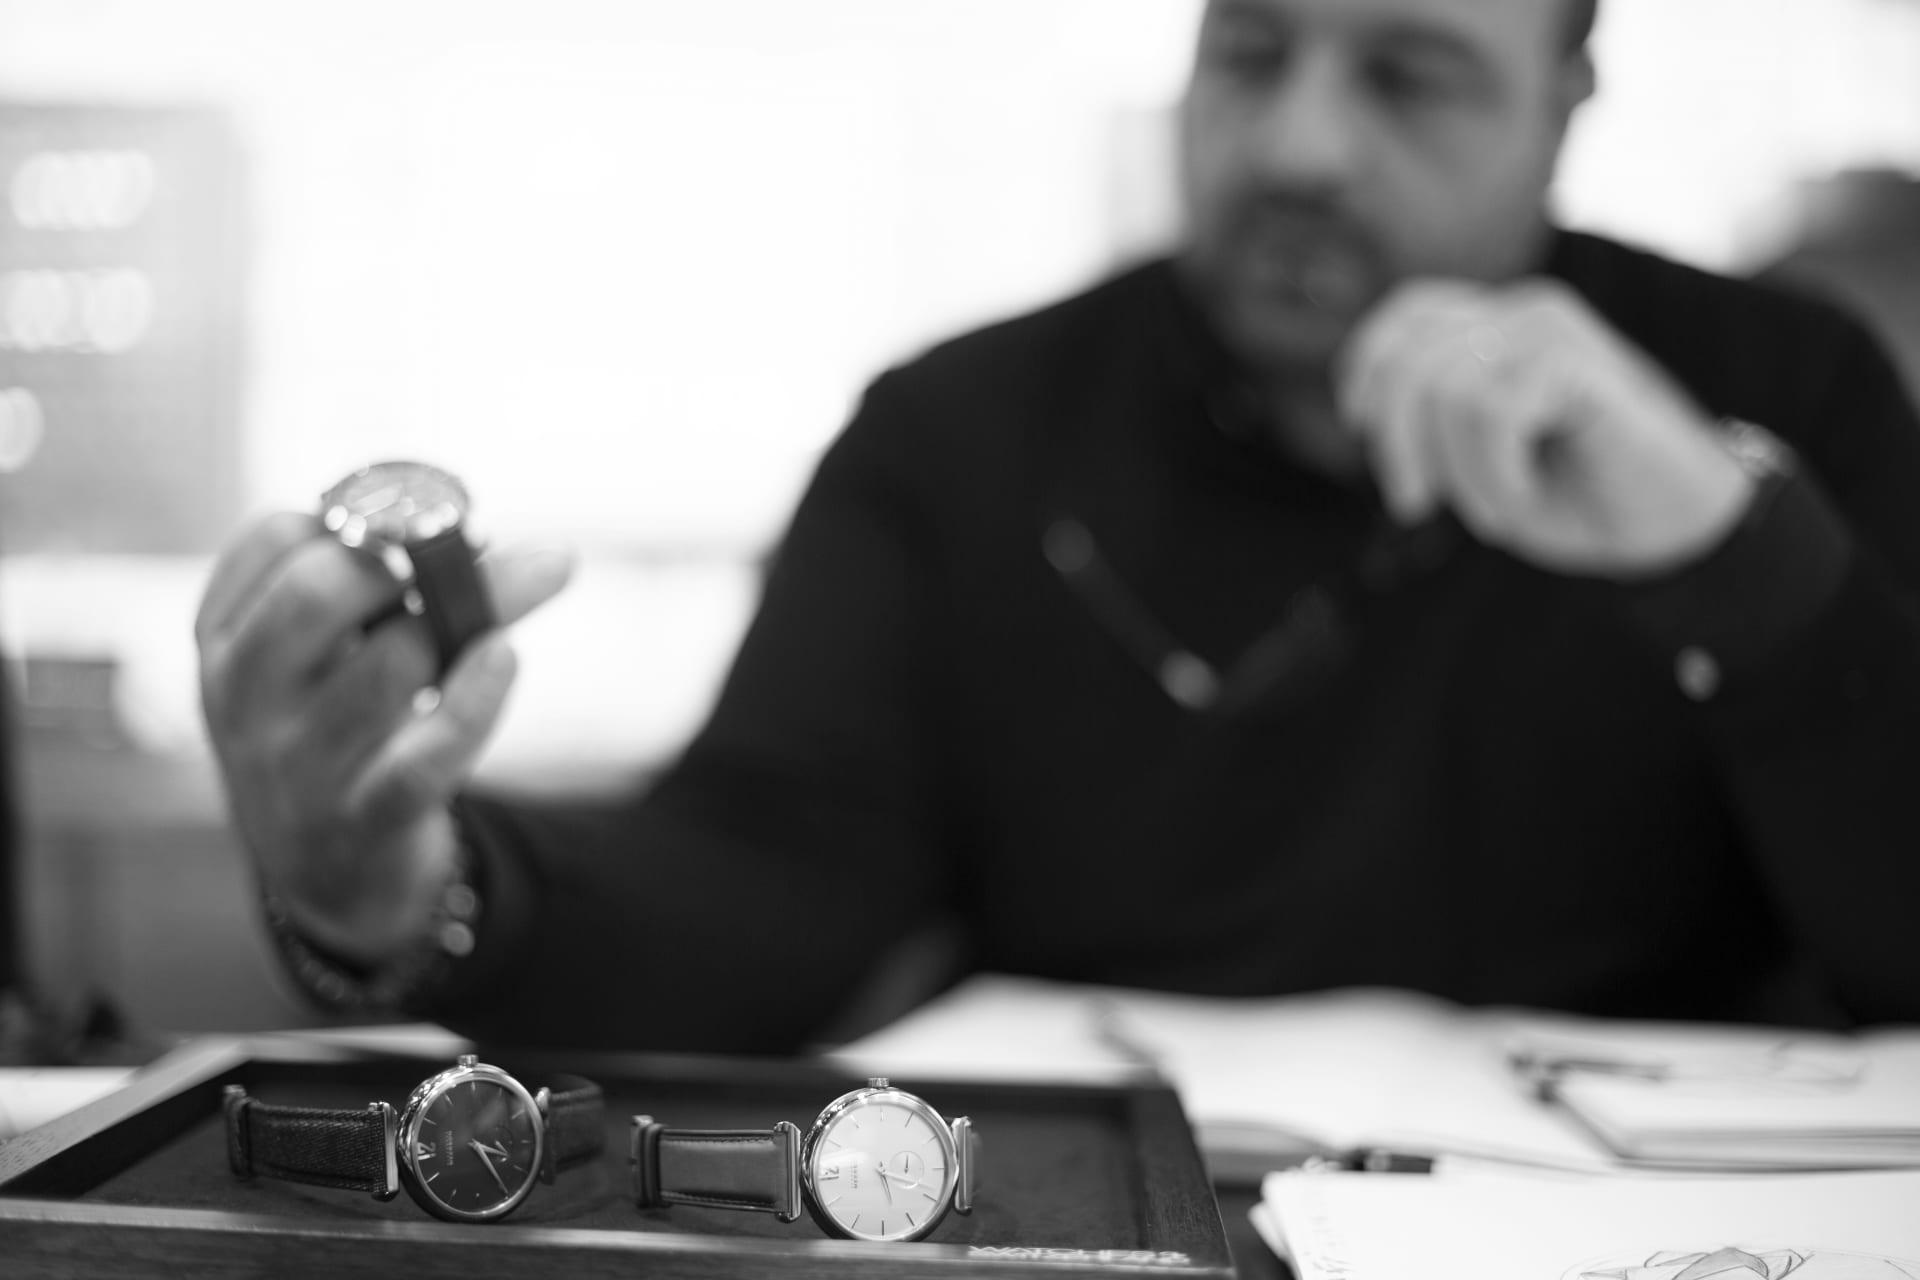 Alexandre_Meerson_Watches_of_Switzerland_Designer_in_Residence_1